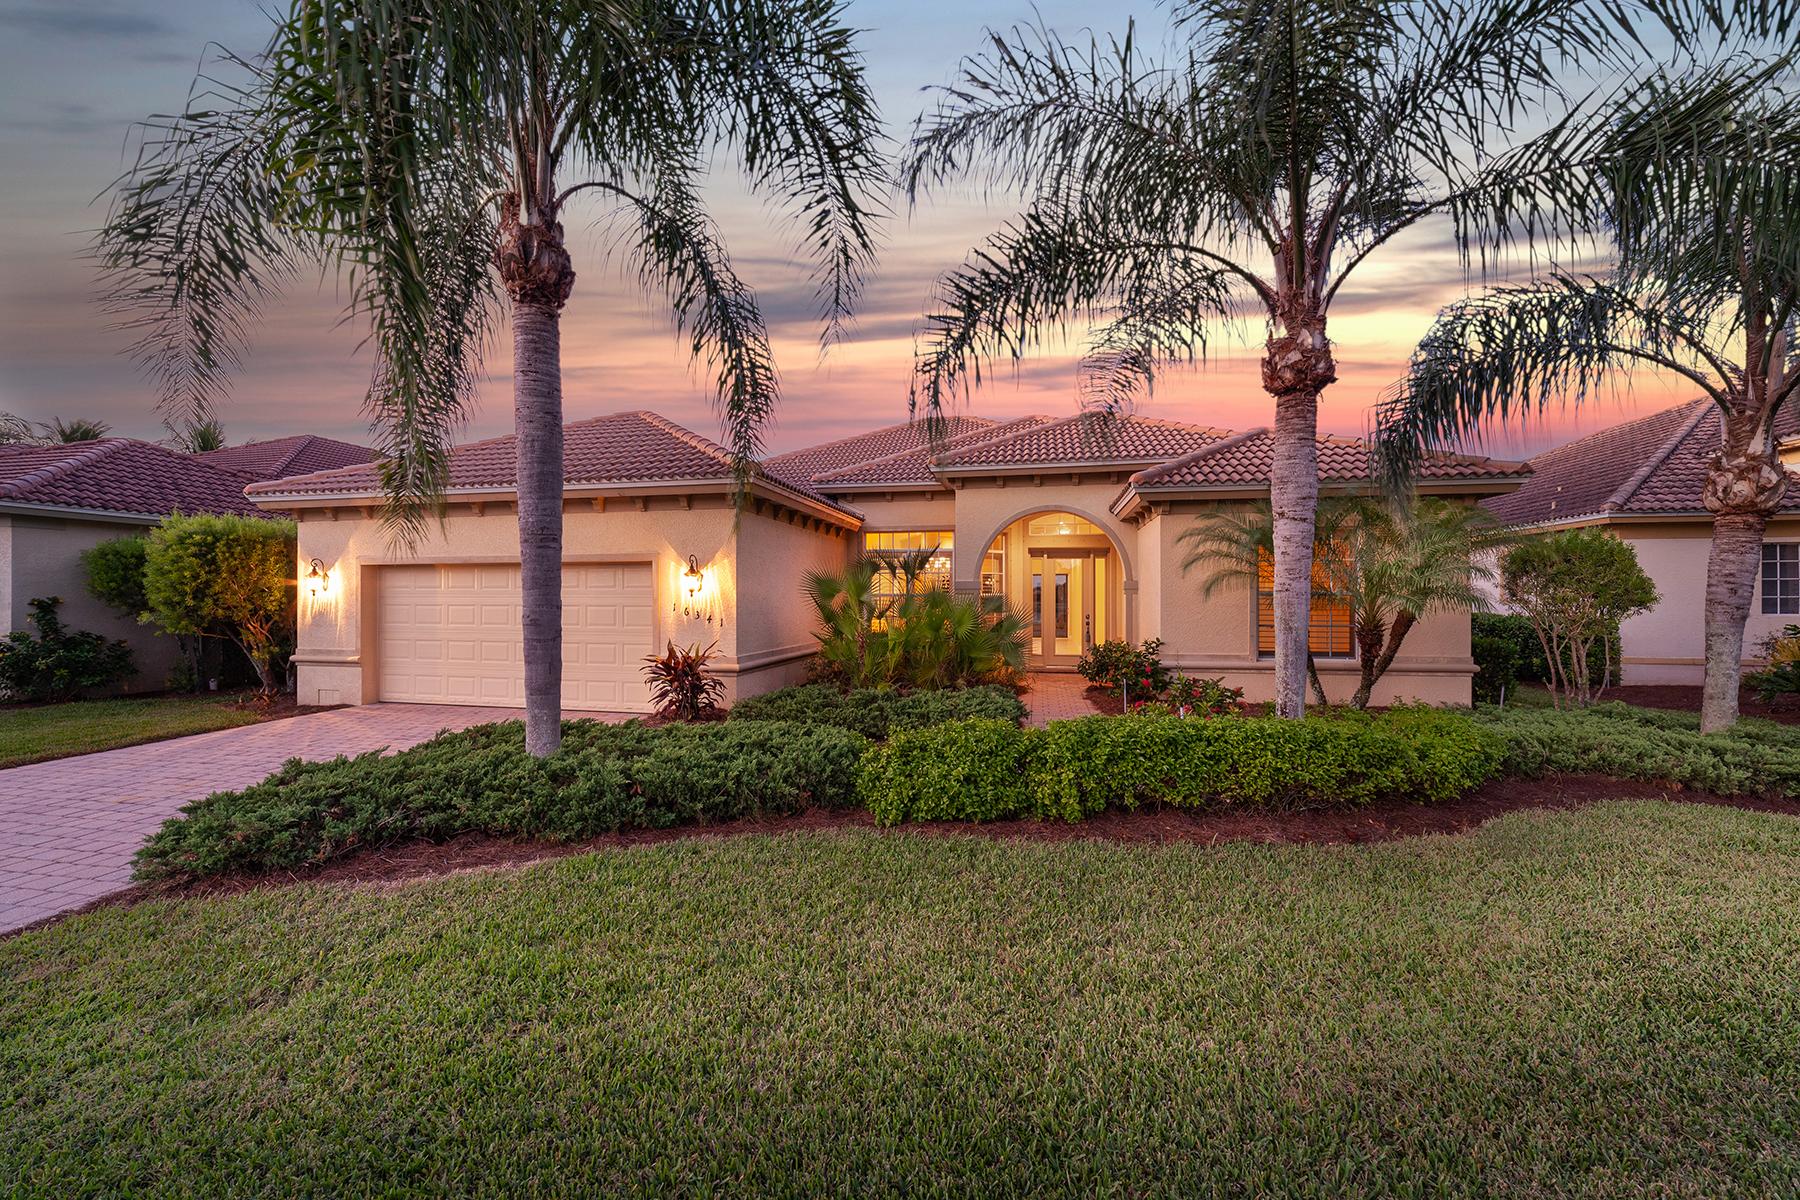 Single Family Homes のために 売買 アット COCO BAY 16341 Coco Hammock Way, Fort Myers, フロリダ 33908 アメリカ